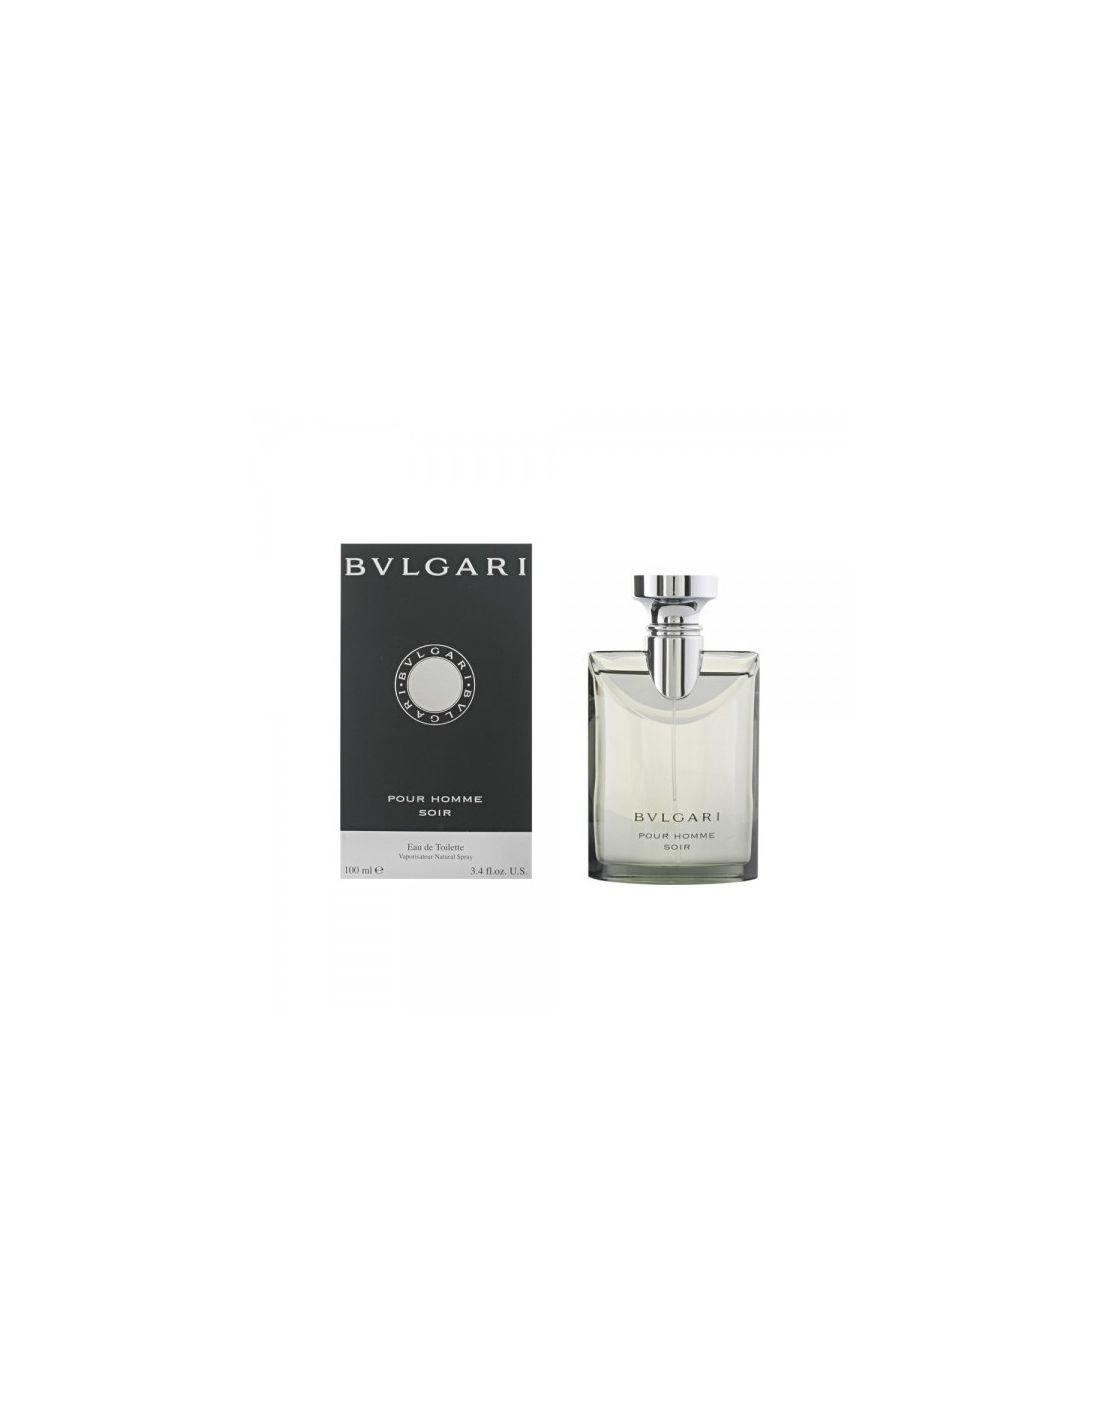 4ec06fd99cb56 Perfume Bvlgari Homme Soir Eau de Toilette 100 ml - Perfumes 24 ®